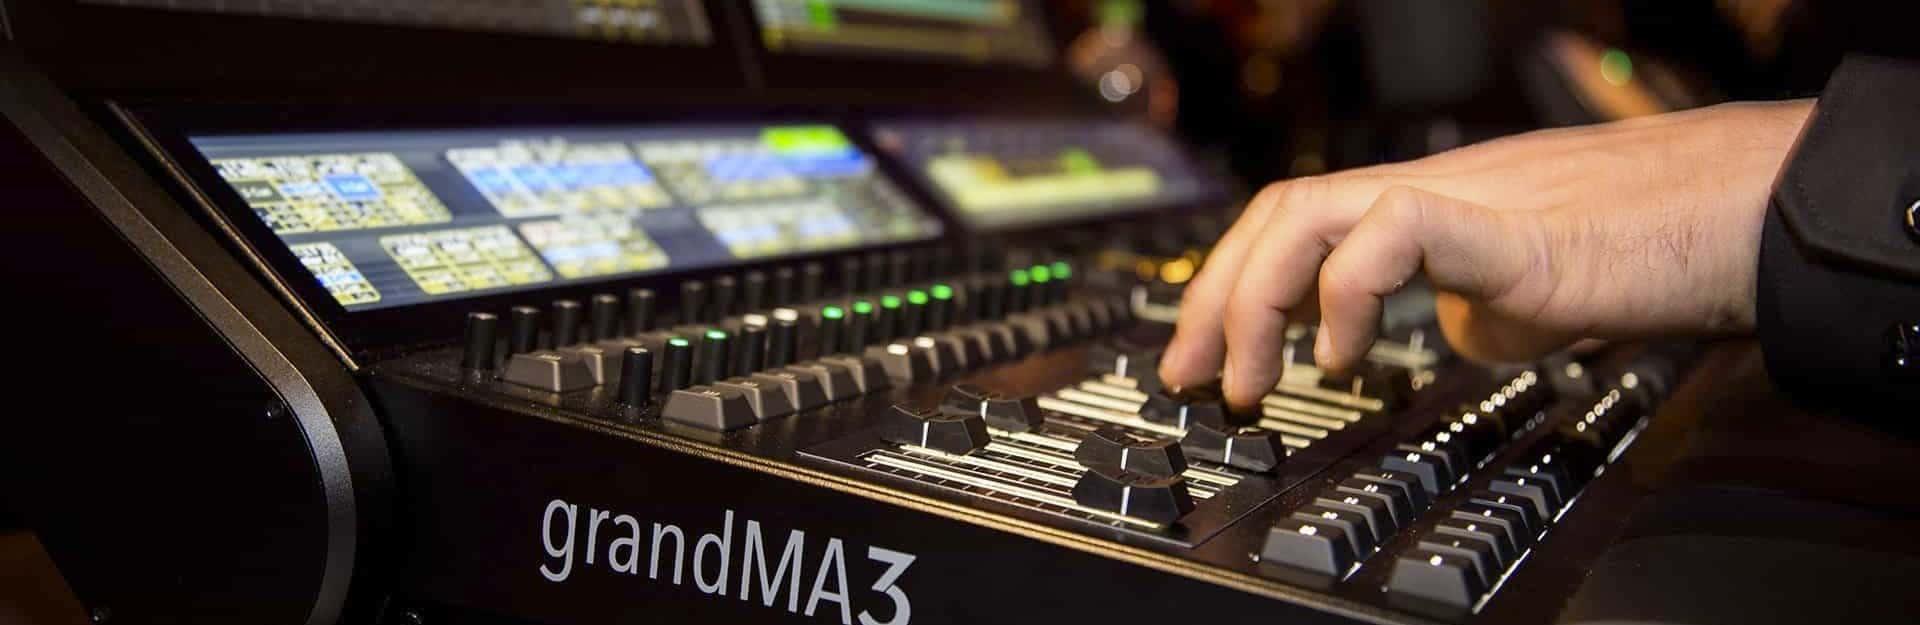 GrandMA3 Lighting console rental Spain